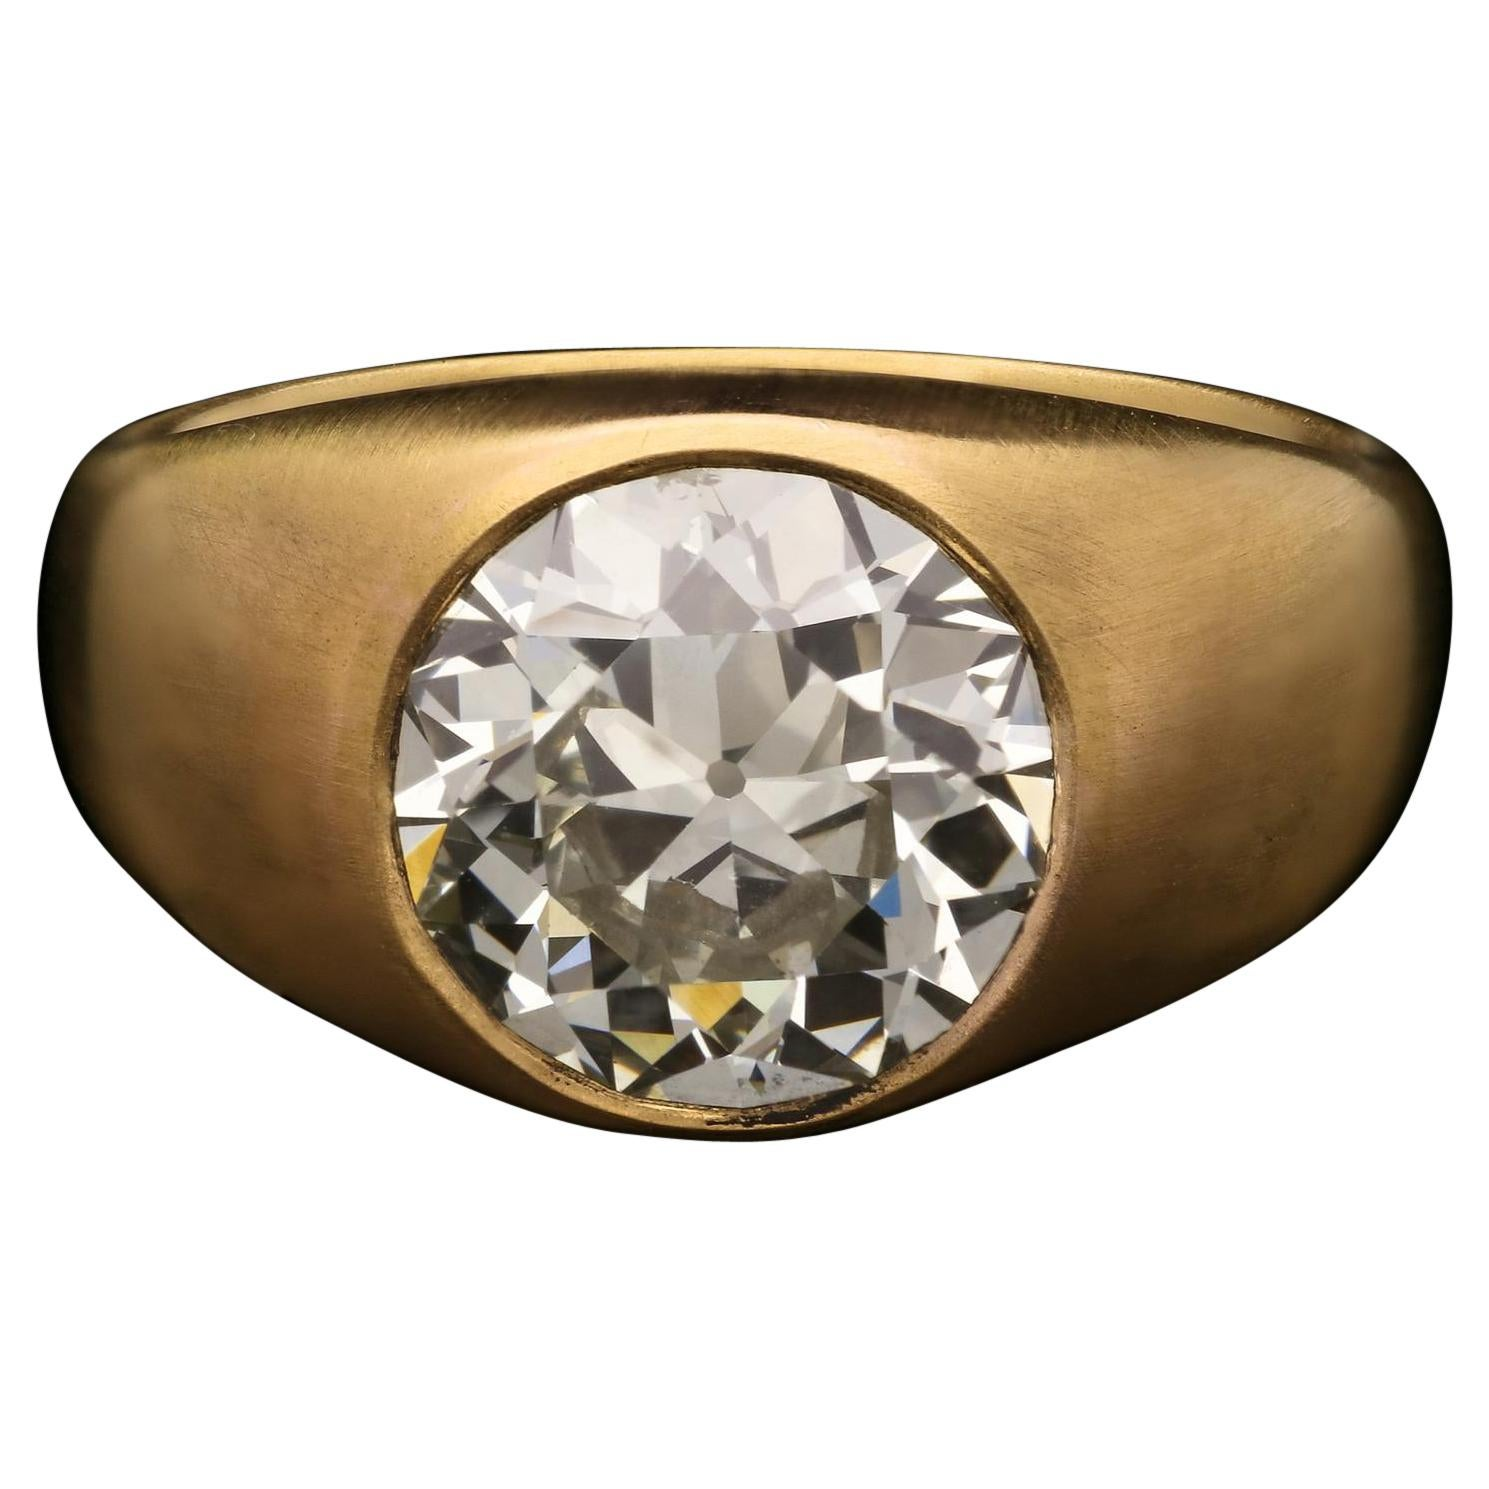 Hancocks 3.61carat Old European Cut Diamond & 22k Gold Gypsy Ring